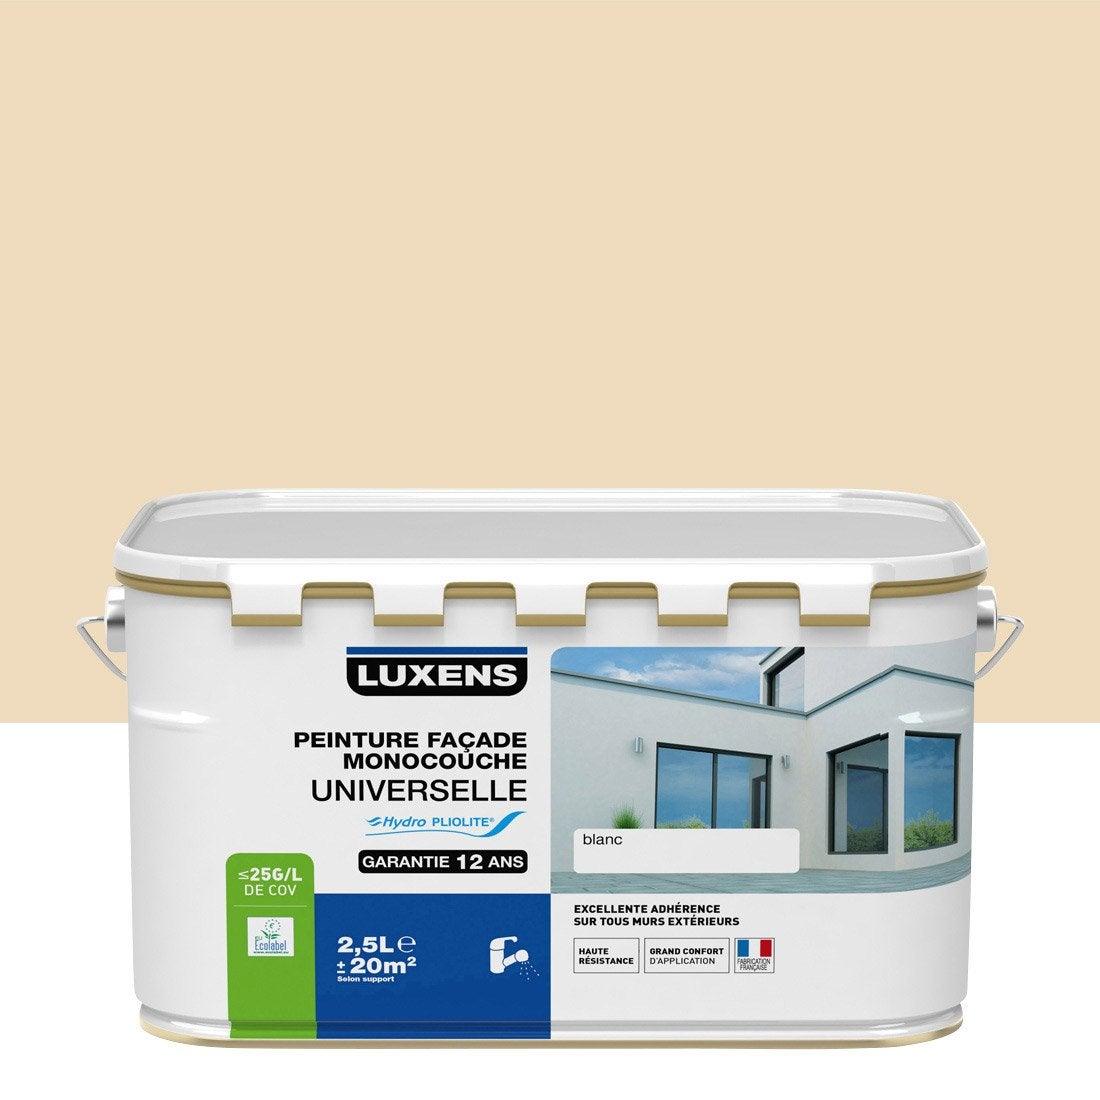 Peinture fa ade universelle luxens sable 2 5 l leroy - Leroy merlin peinture facade ...